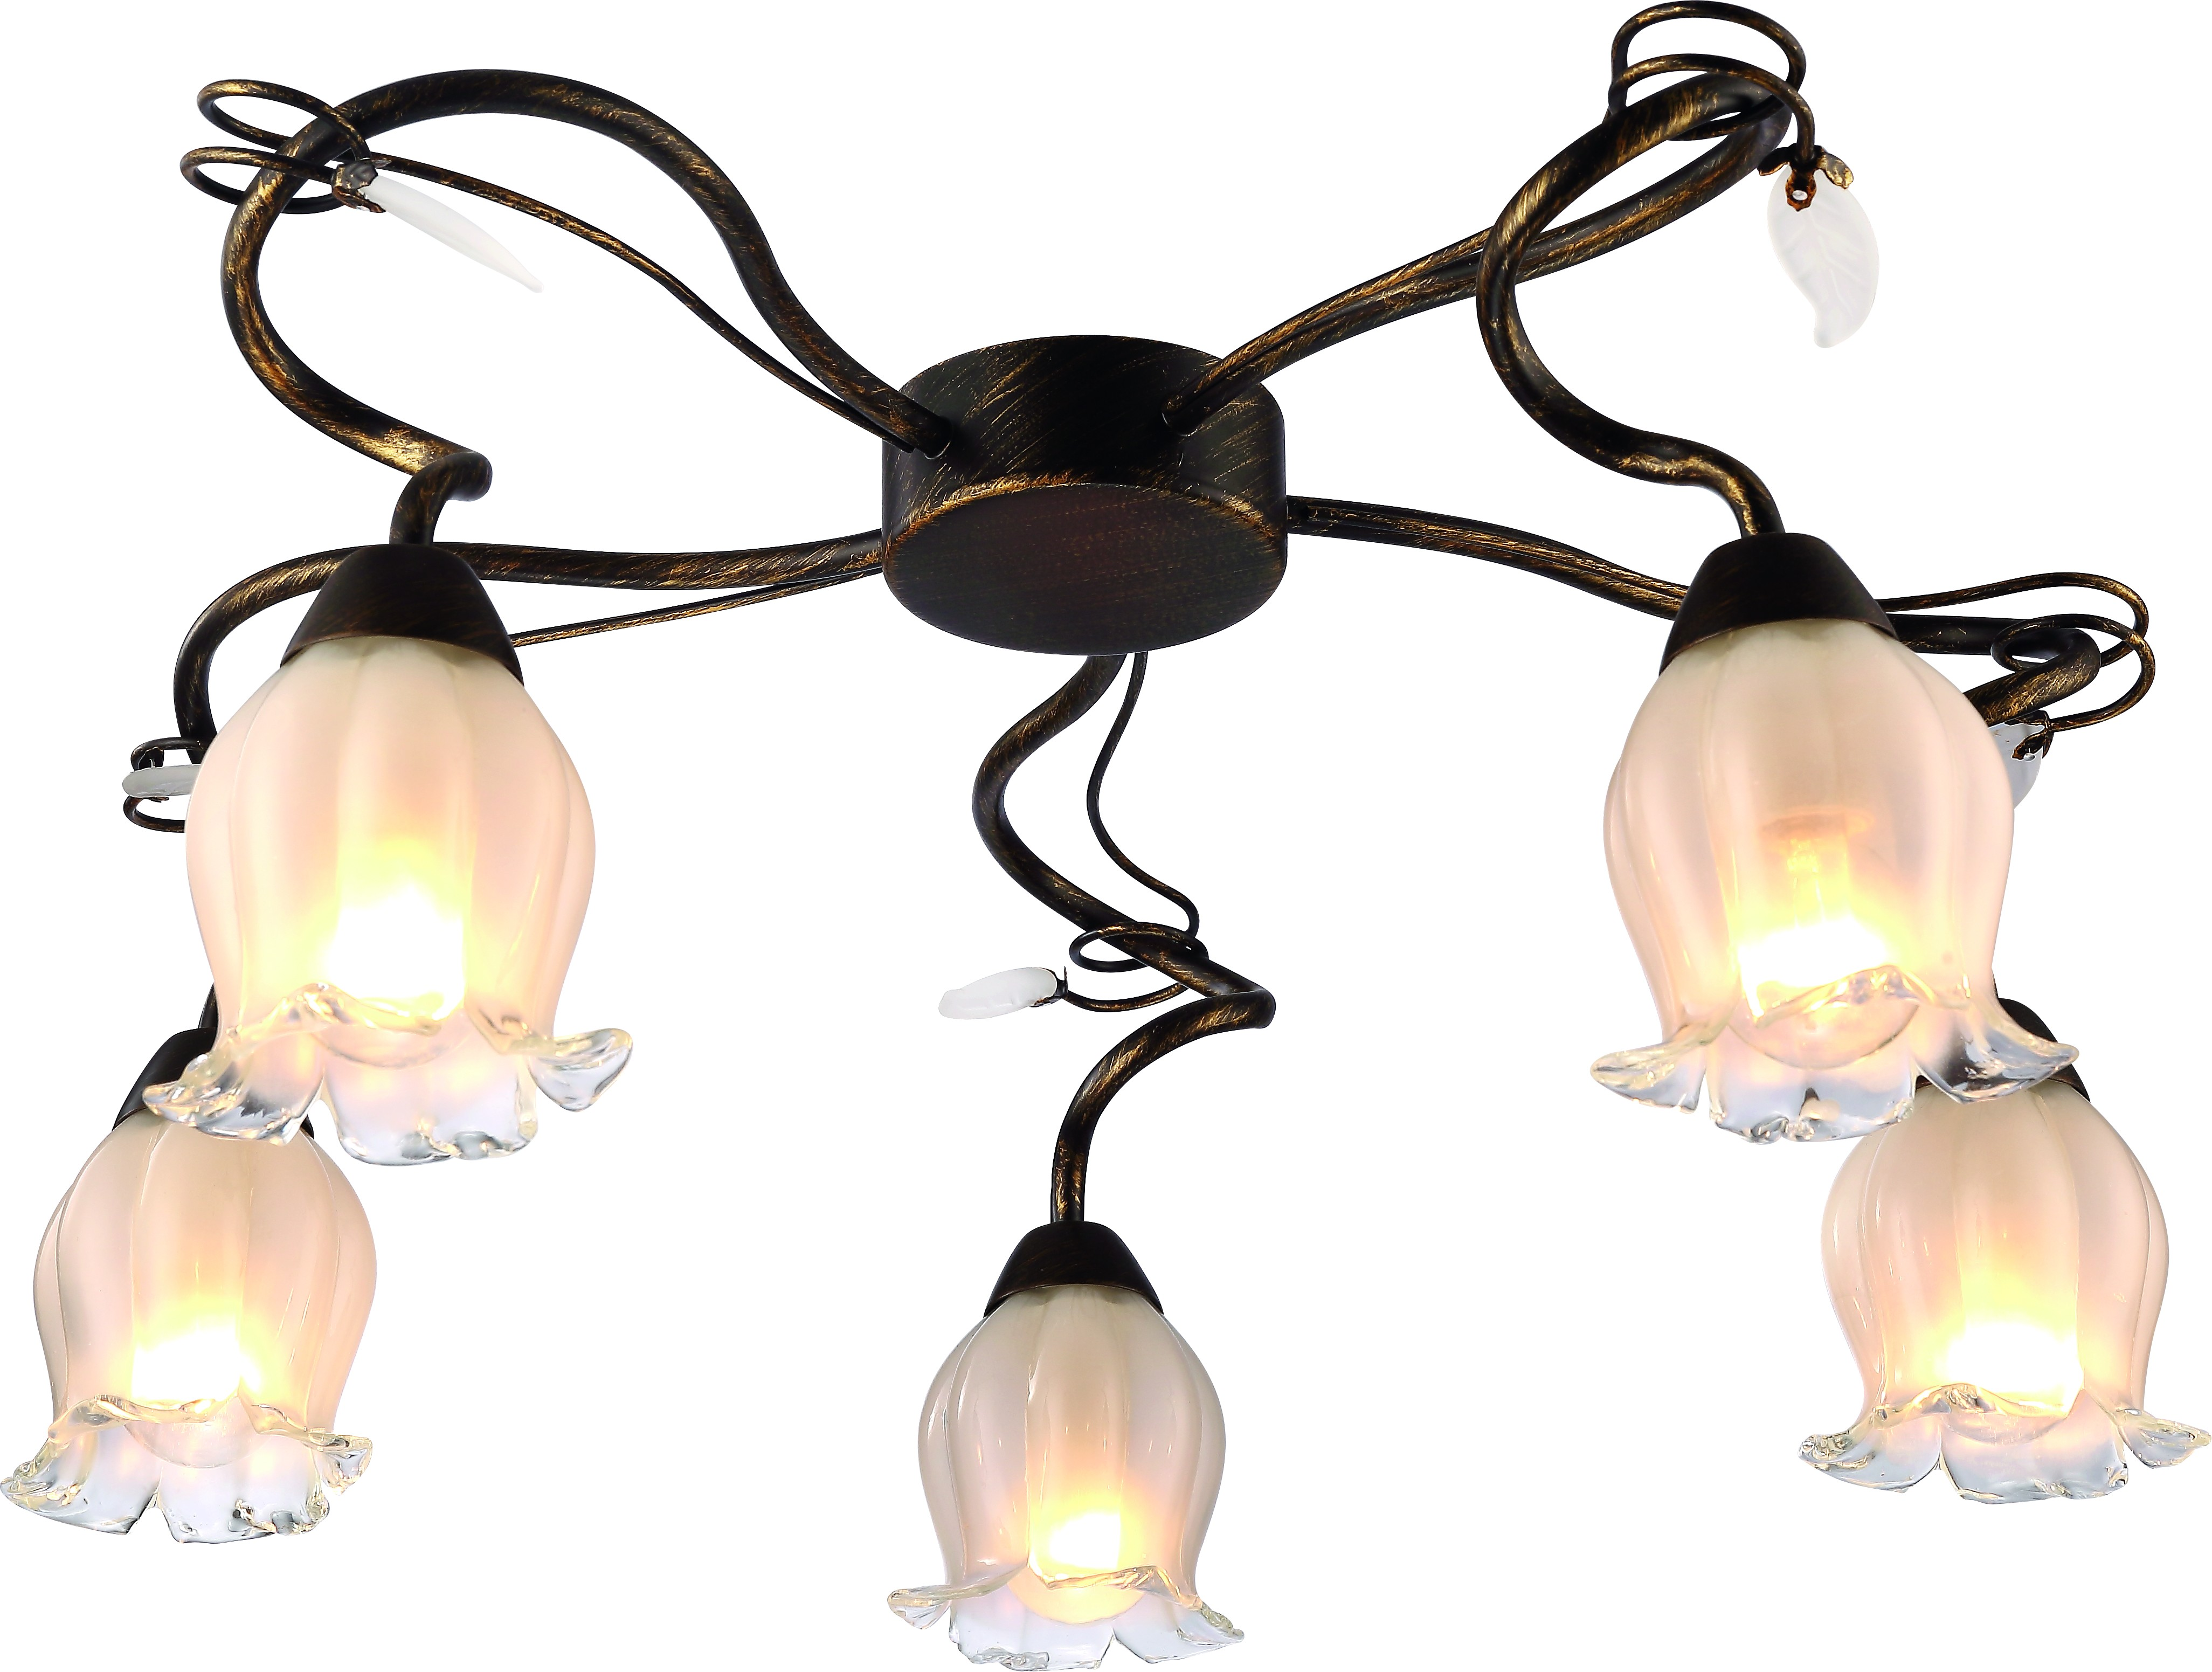 Люстра Arte lamp A7449pl-5br arte lamp потолочная люстра arte lamp 83 a7449pl 5br